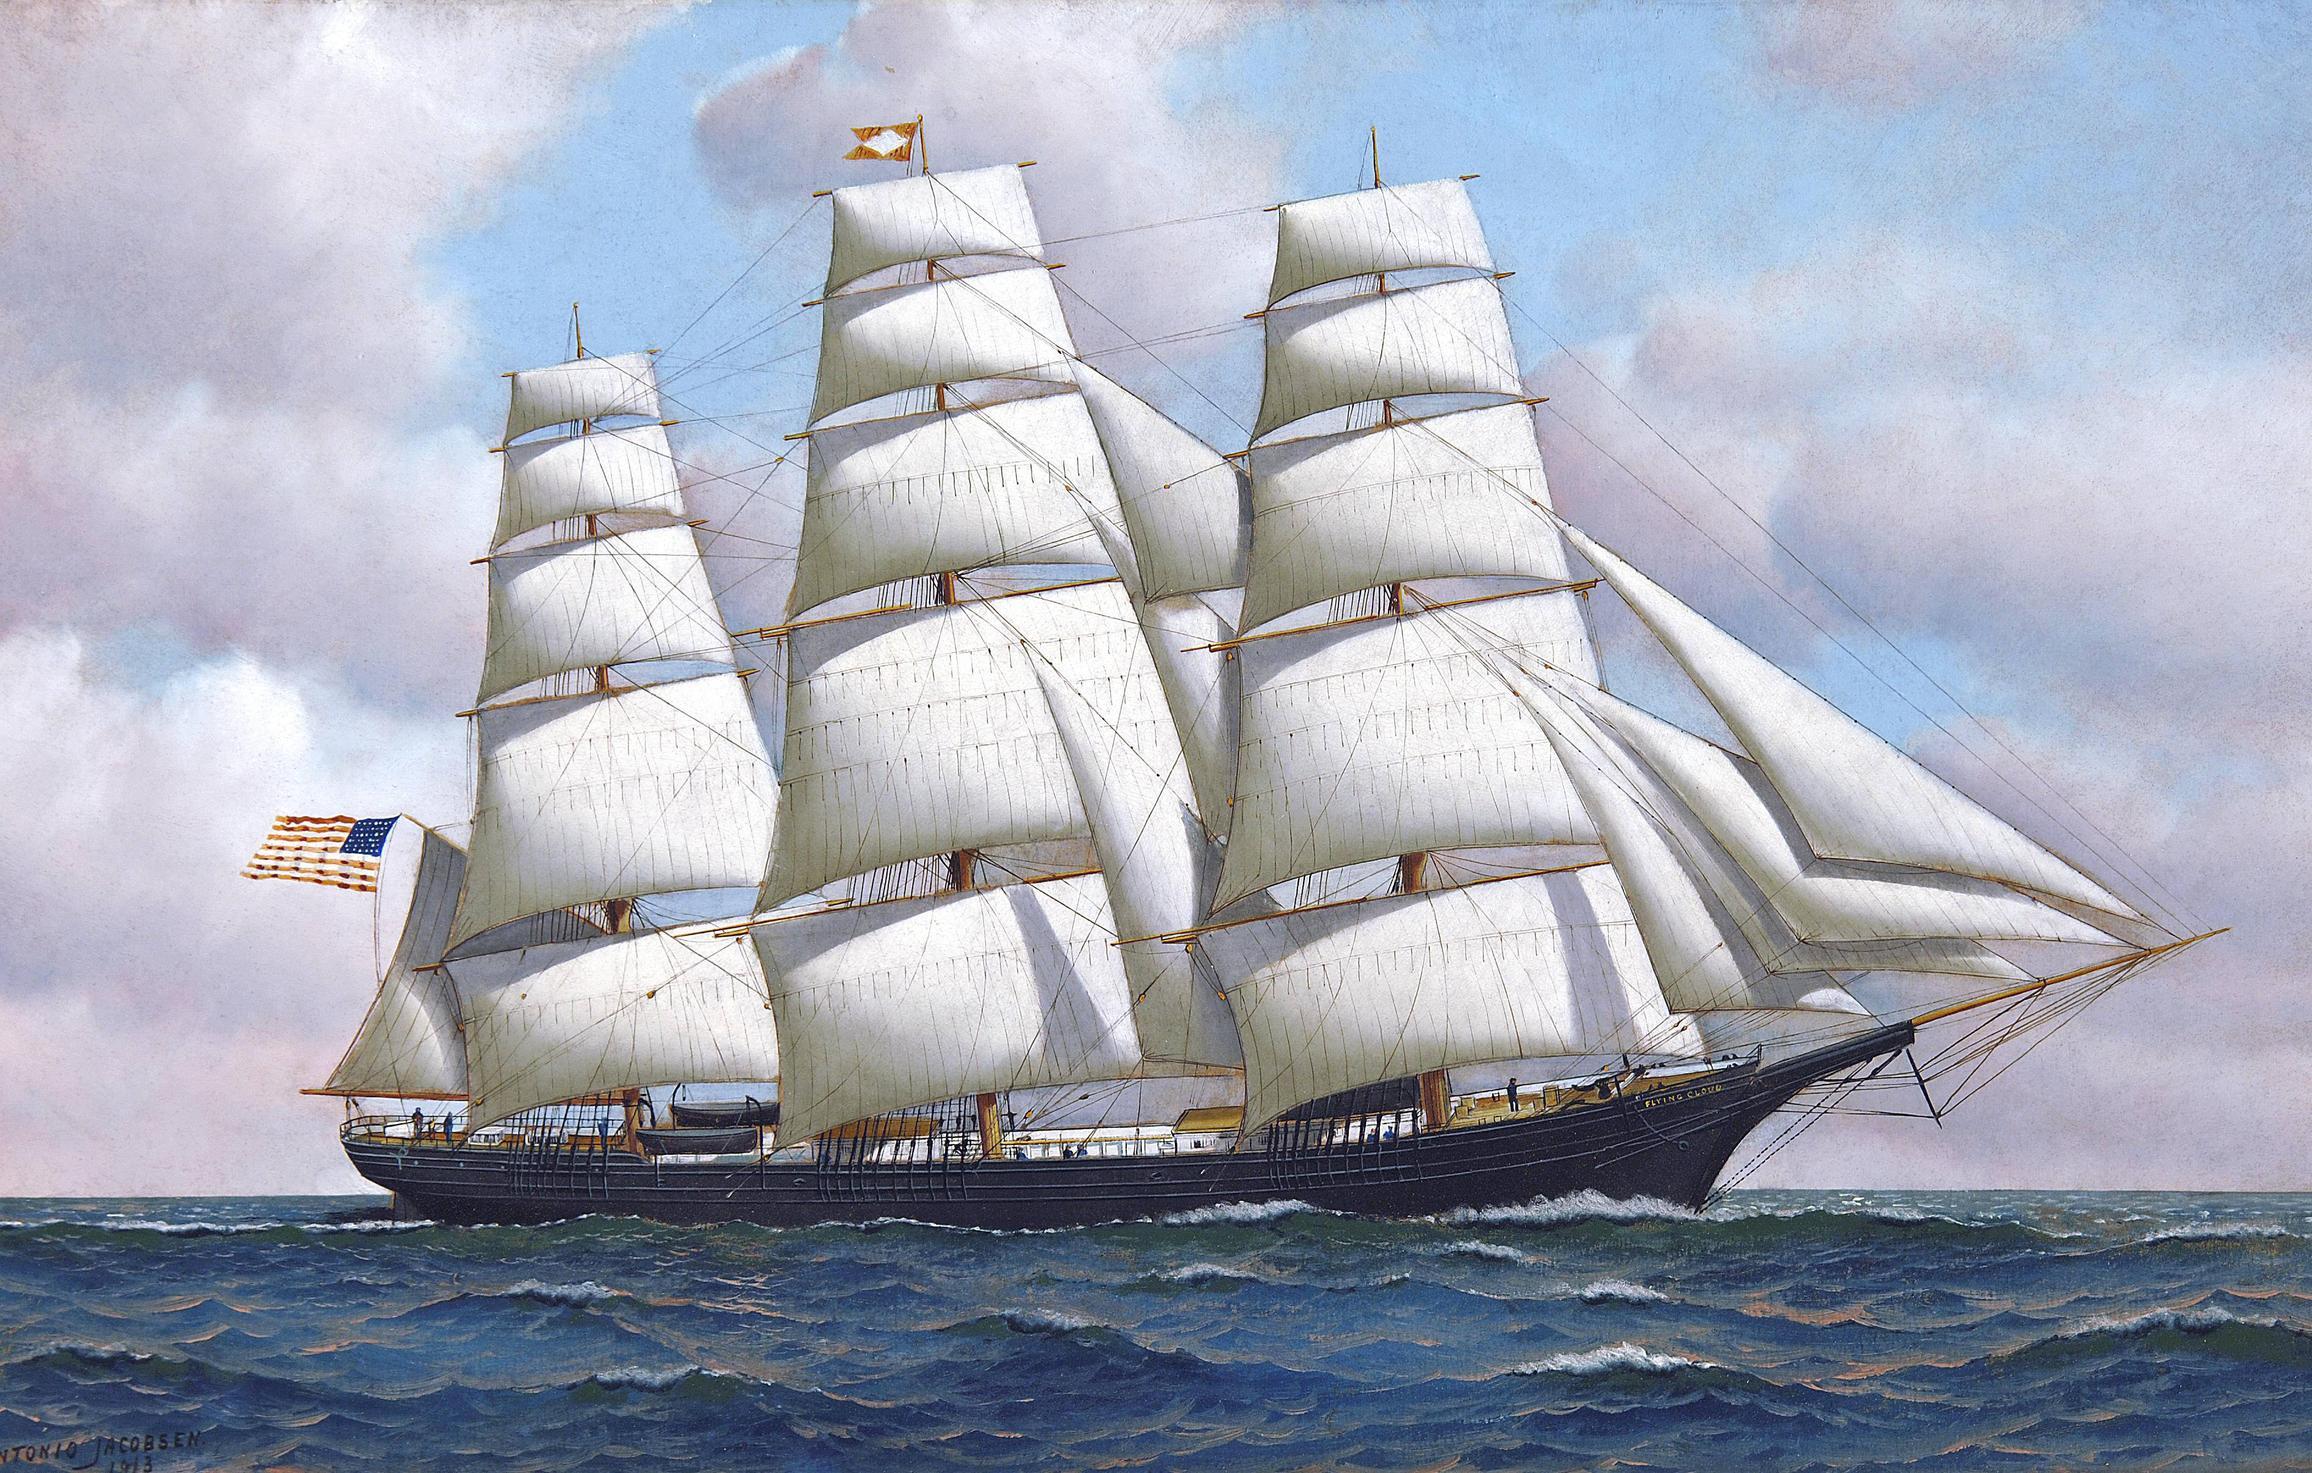 High Resolution Wallpaper | Sailing Ship 2312x1473 px